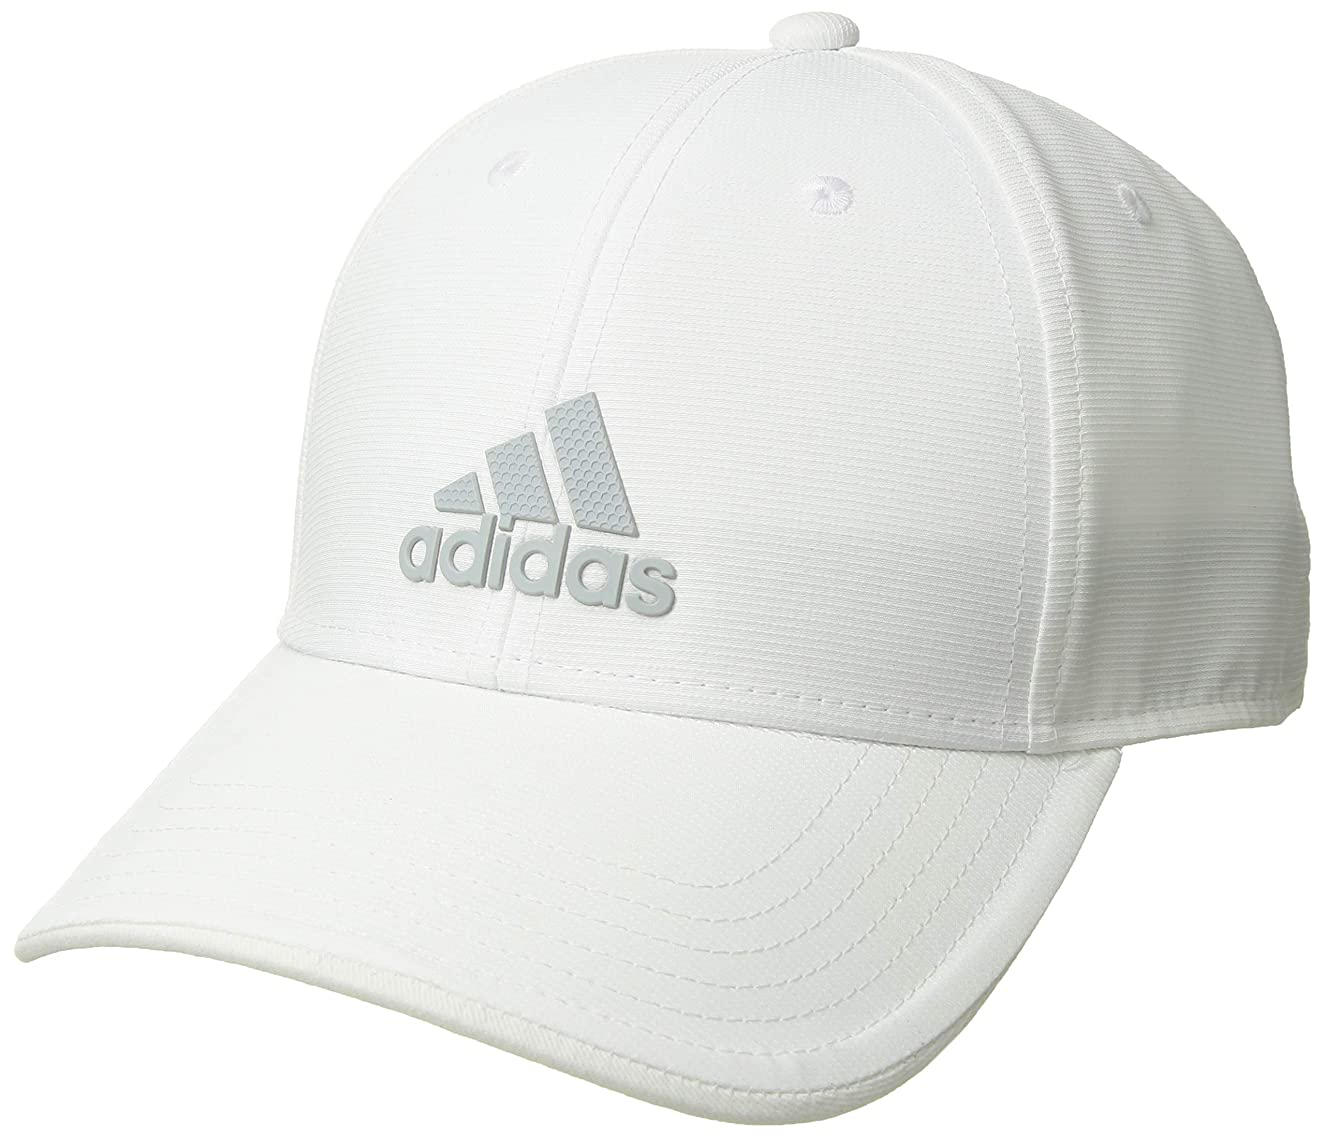 e3c53d0f2 adidas Men's Decision Cap hzont306684 - tembredecarteret.com